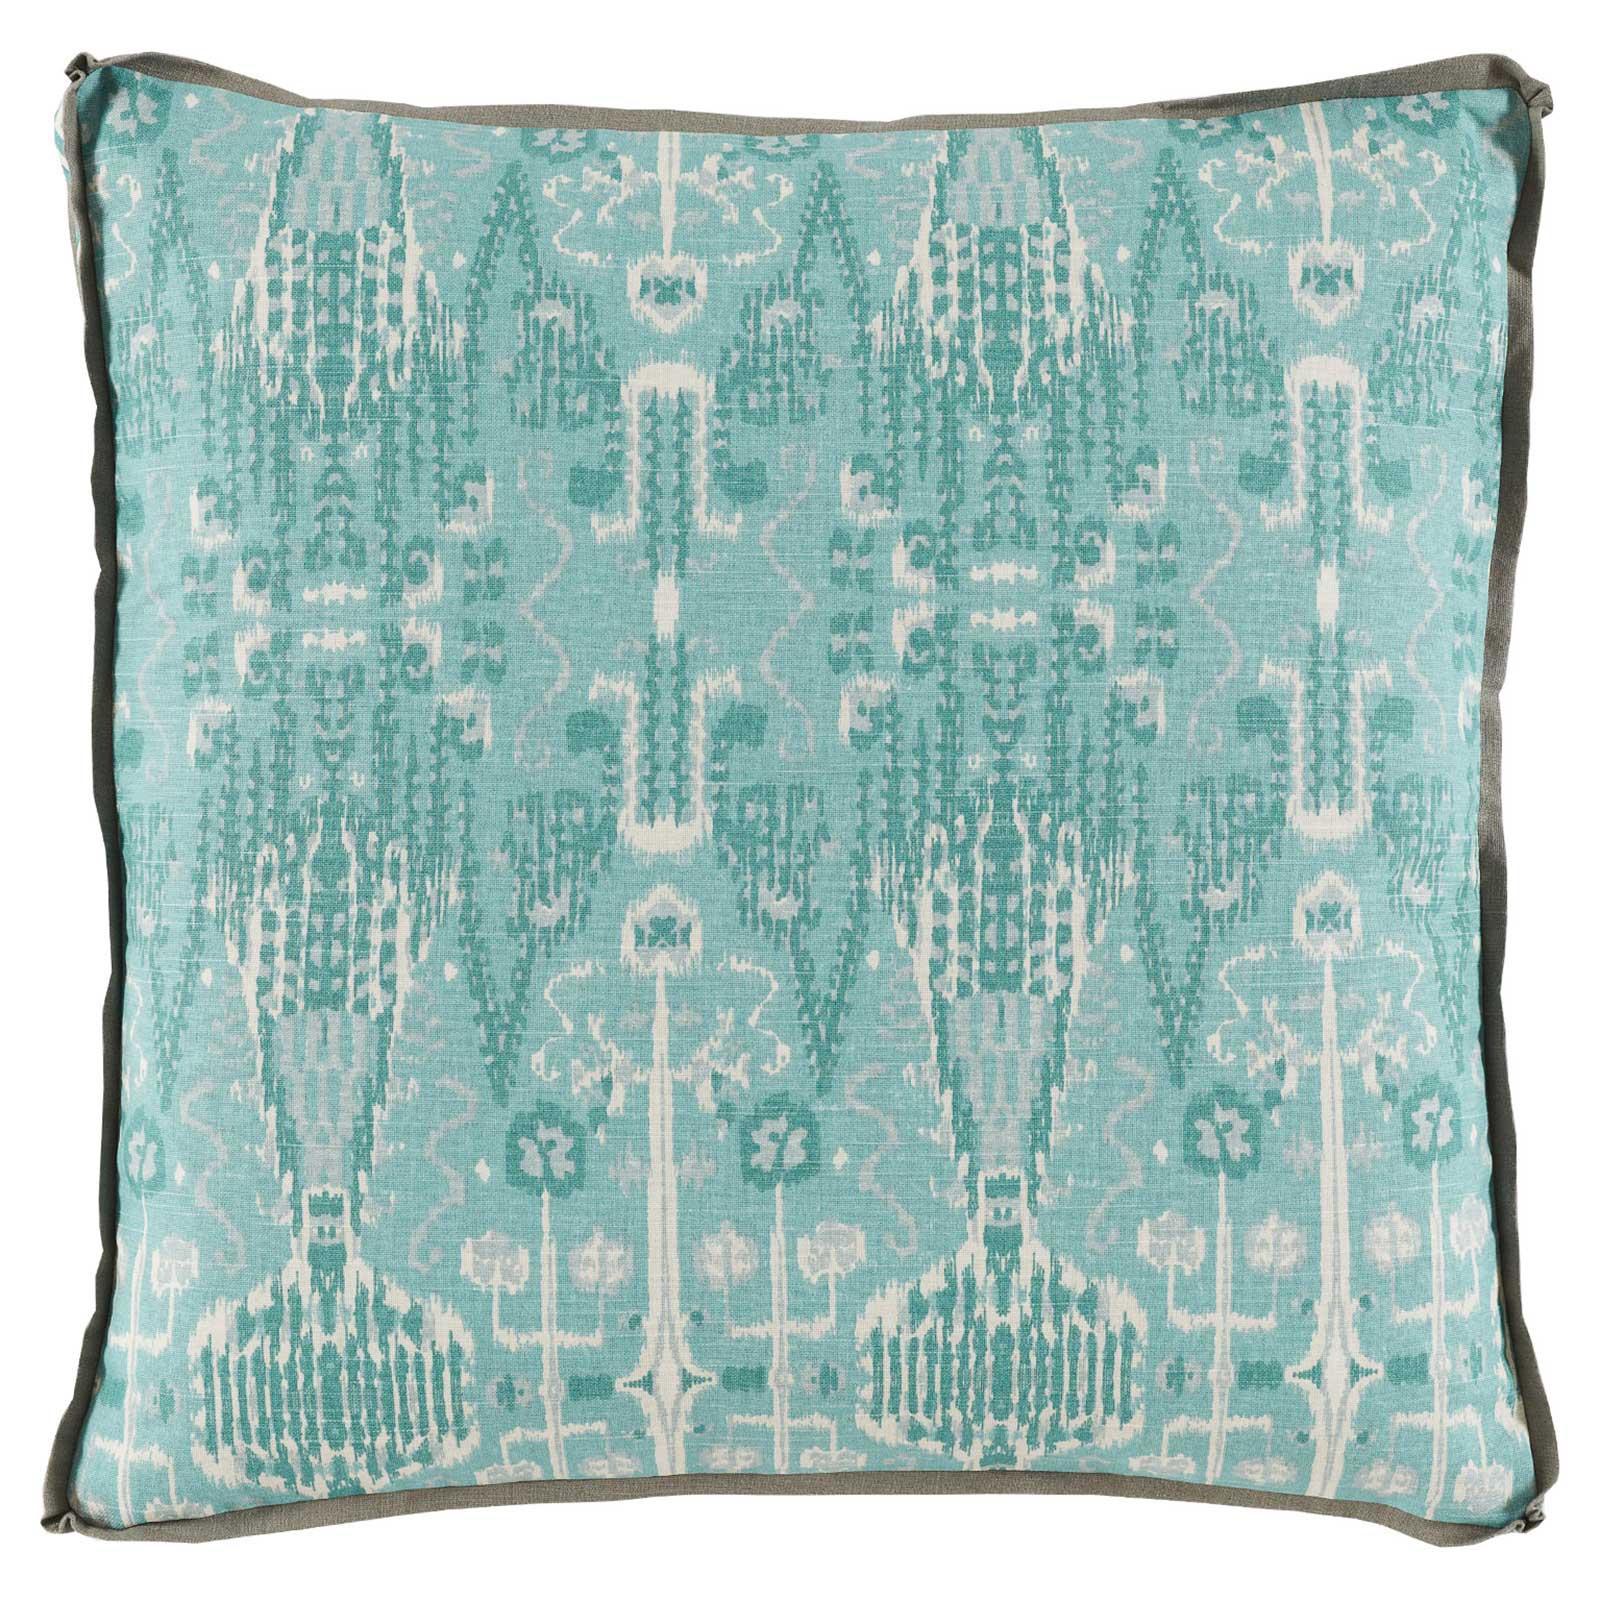 Kolkata Global Bazaar Aqua Ikat Pillow - 24x24